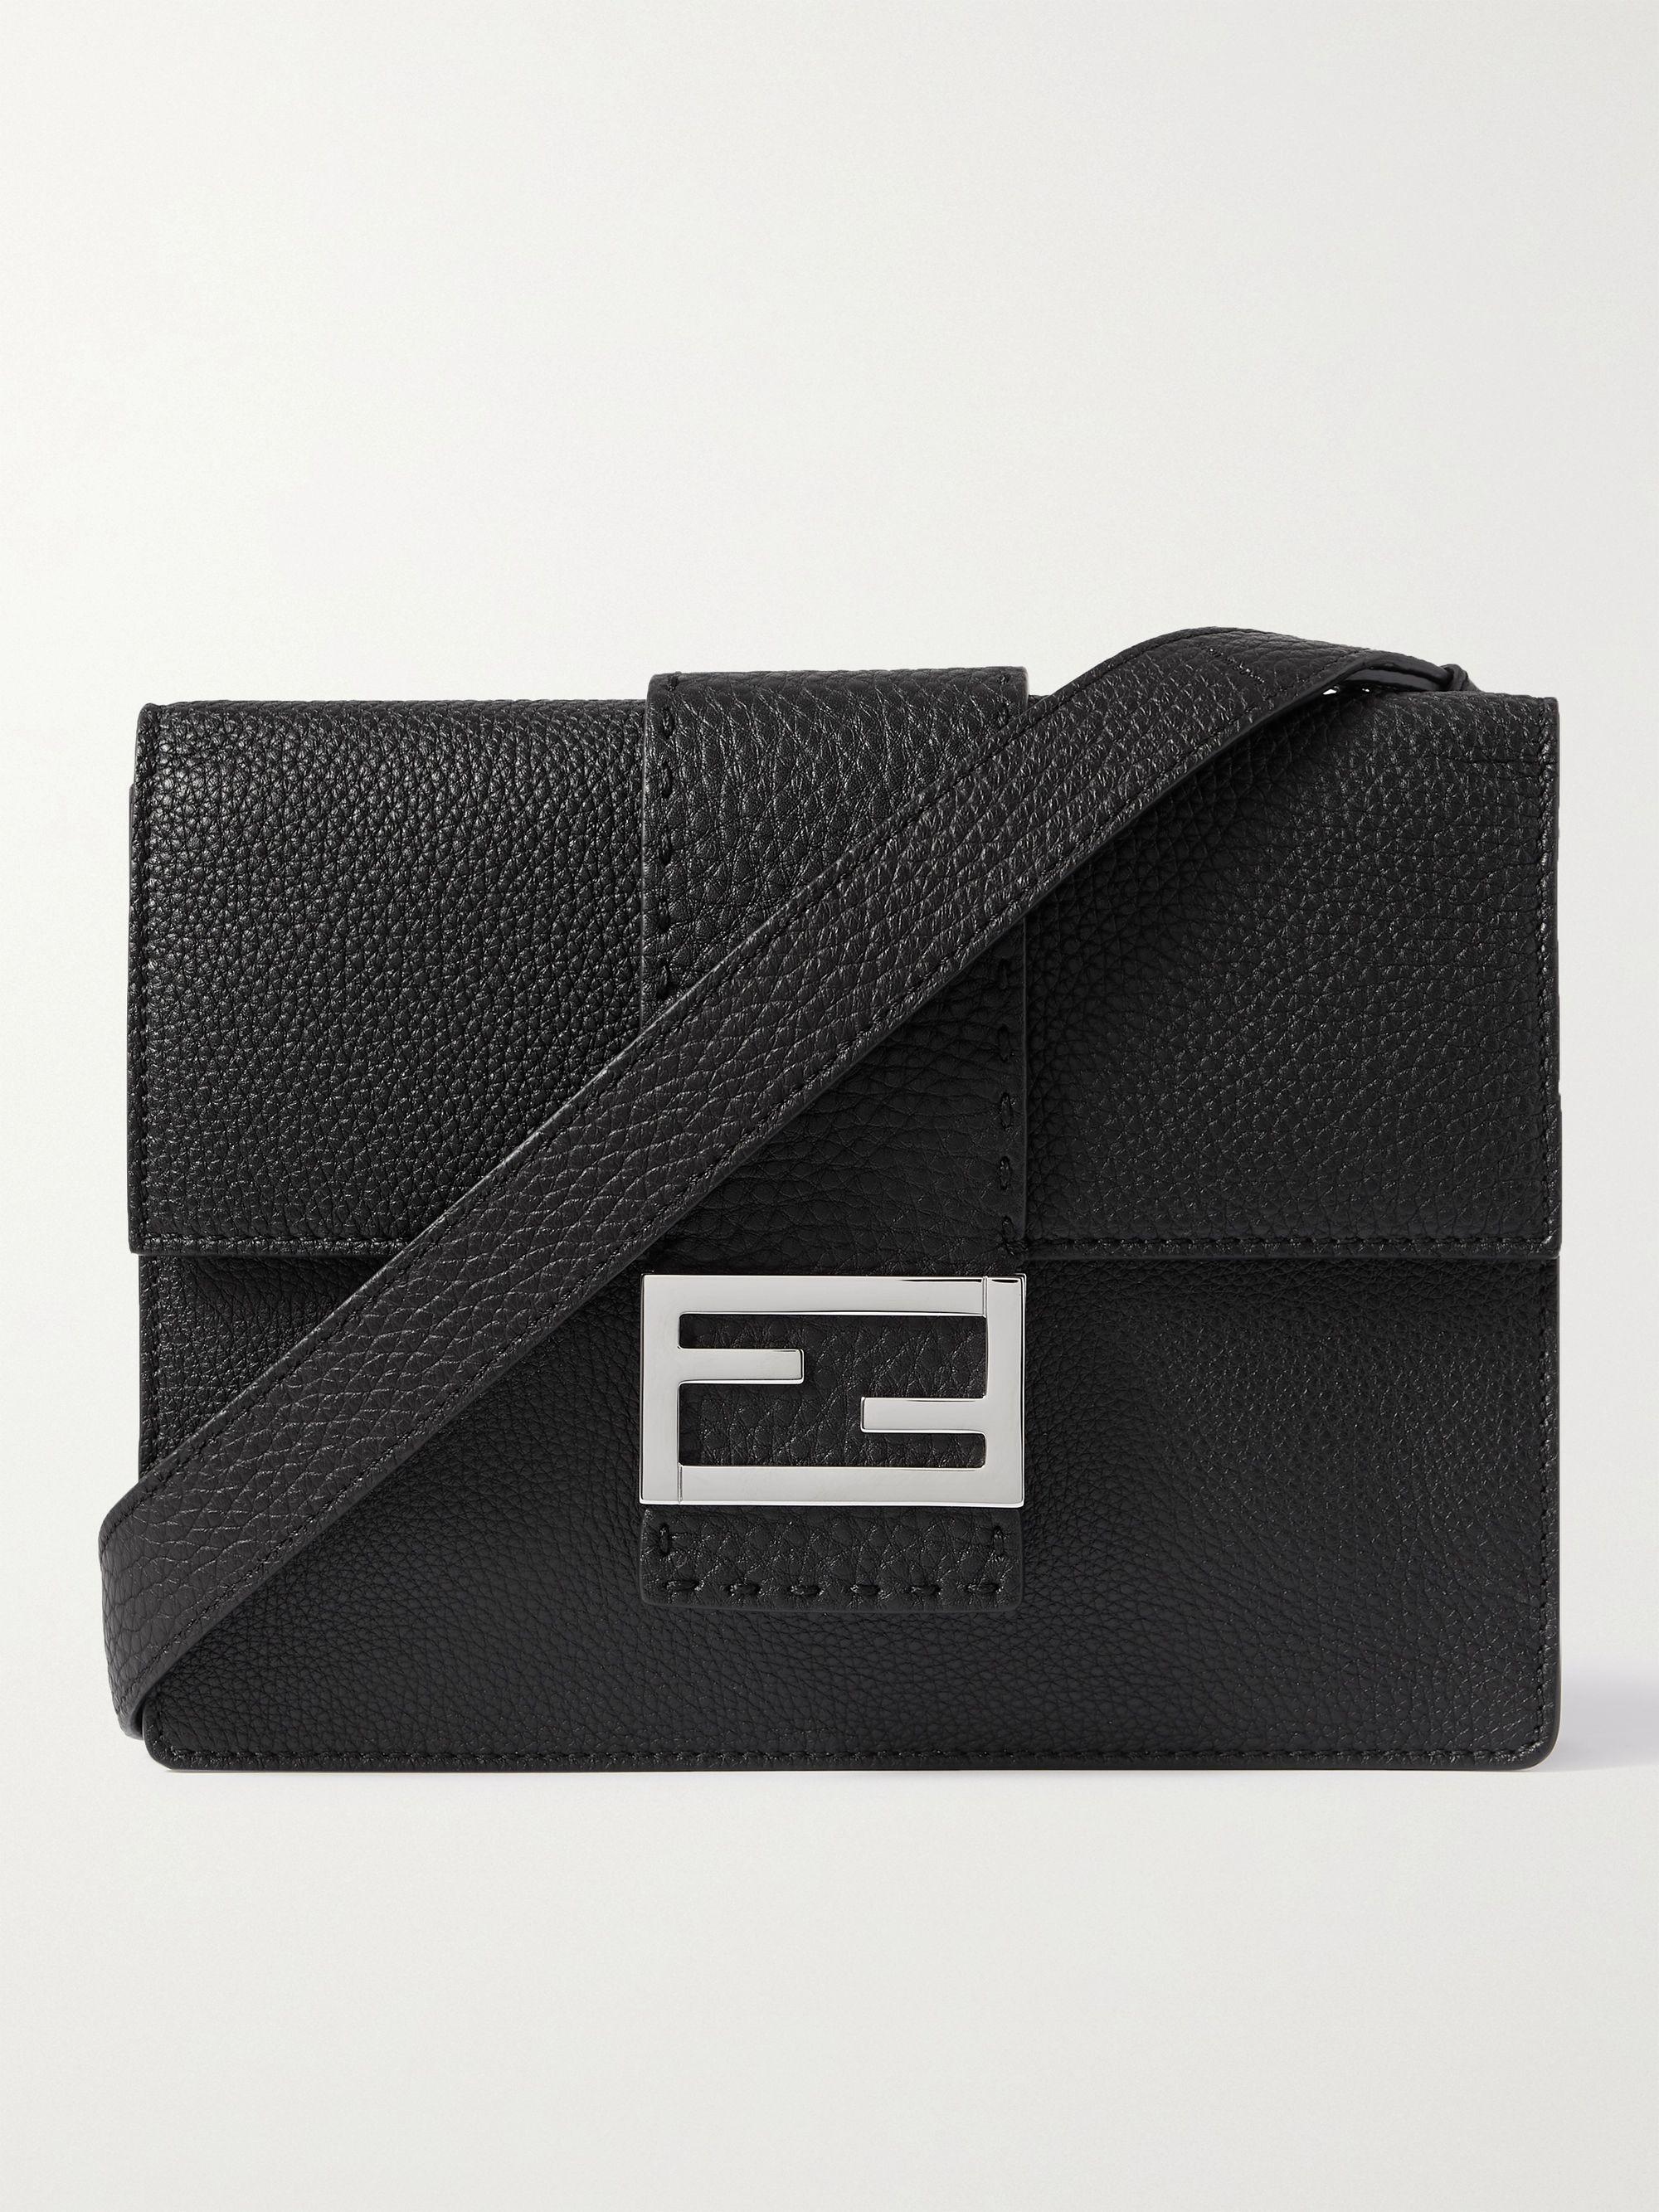 FENDI Flat Baguette Small Logo-Embellished Full-Grain Leather Messenger Bag